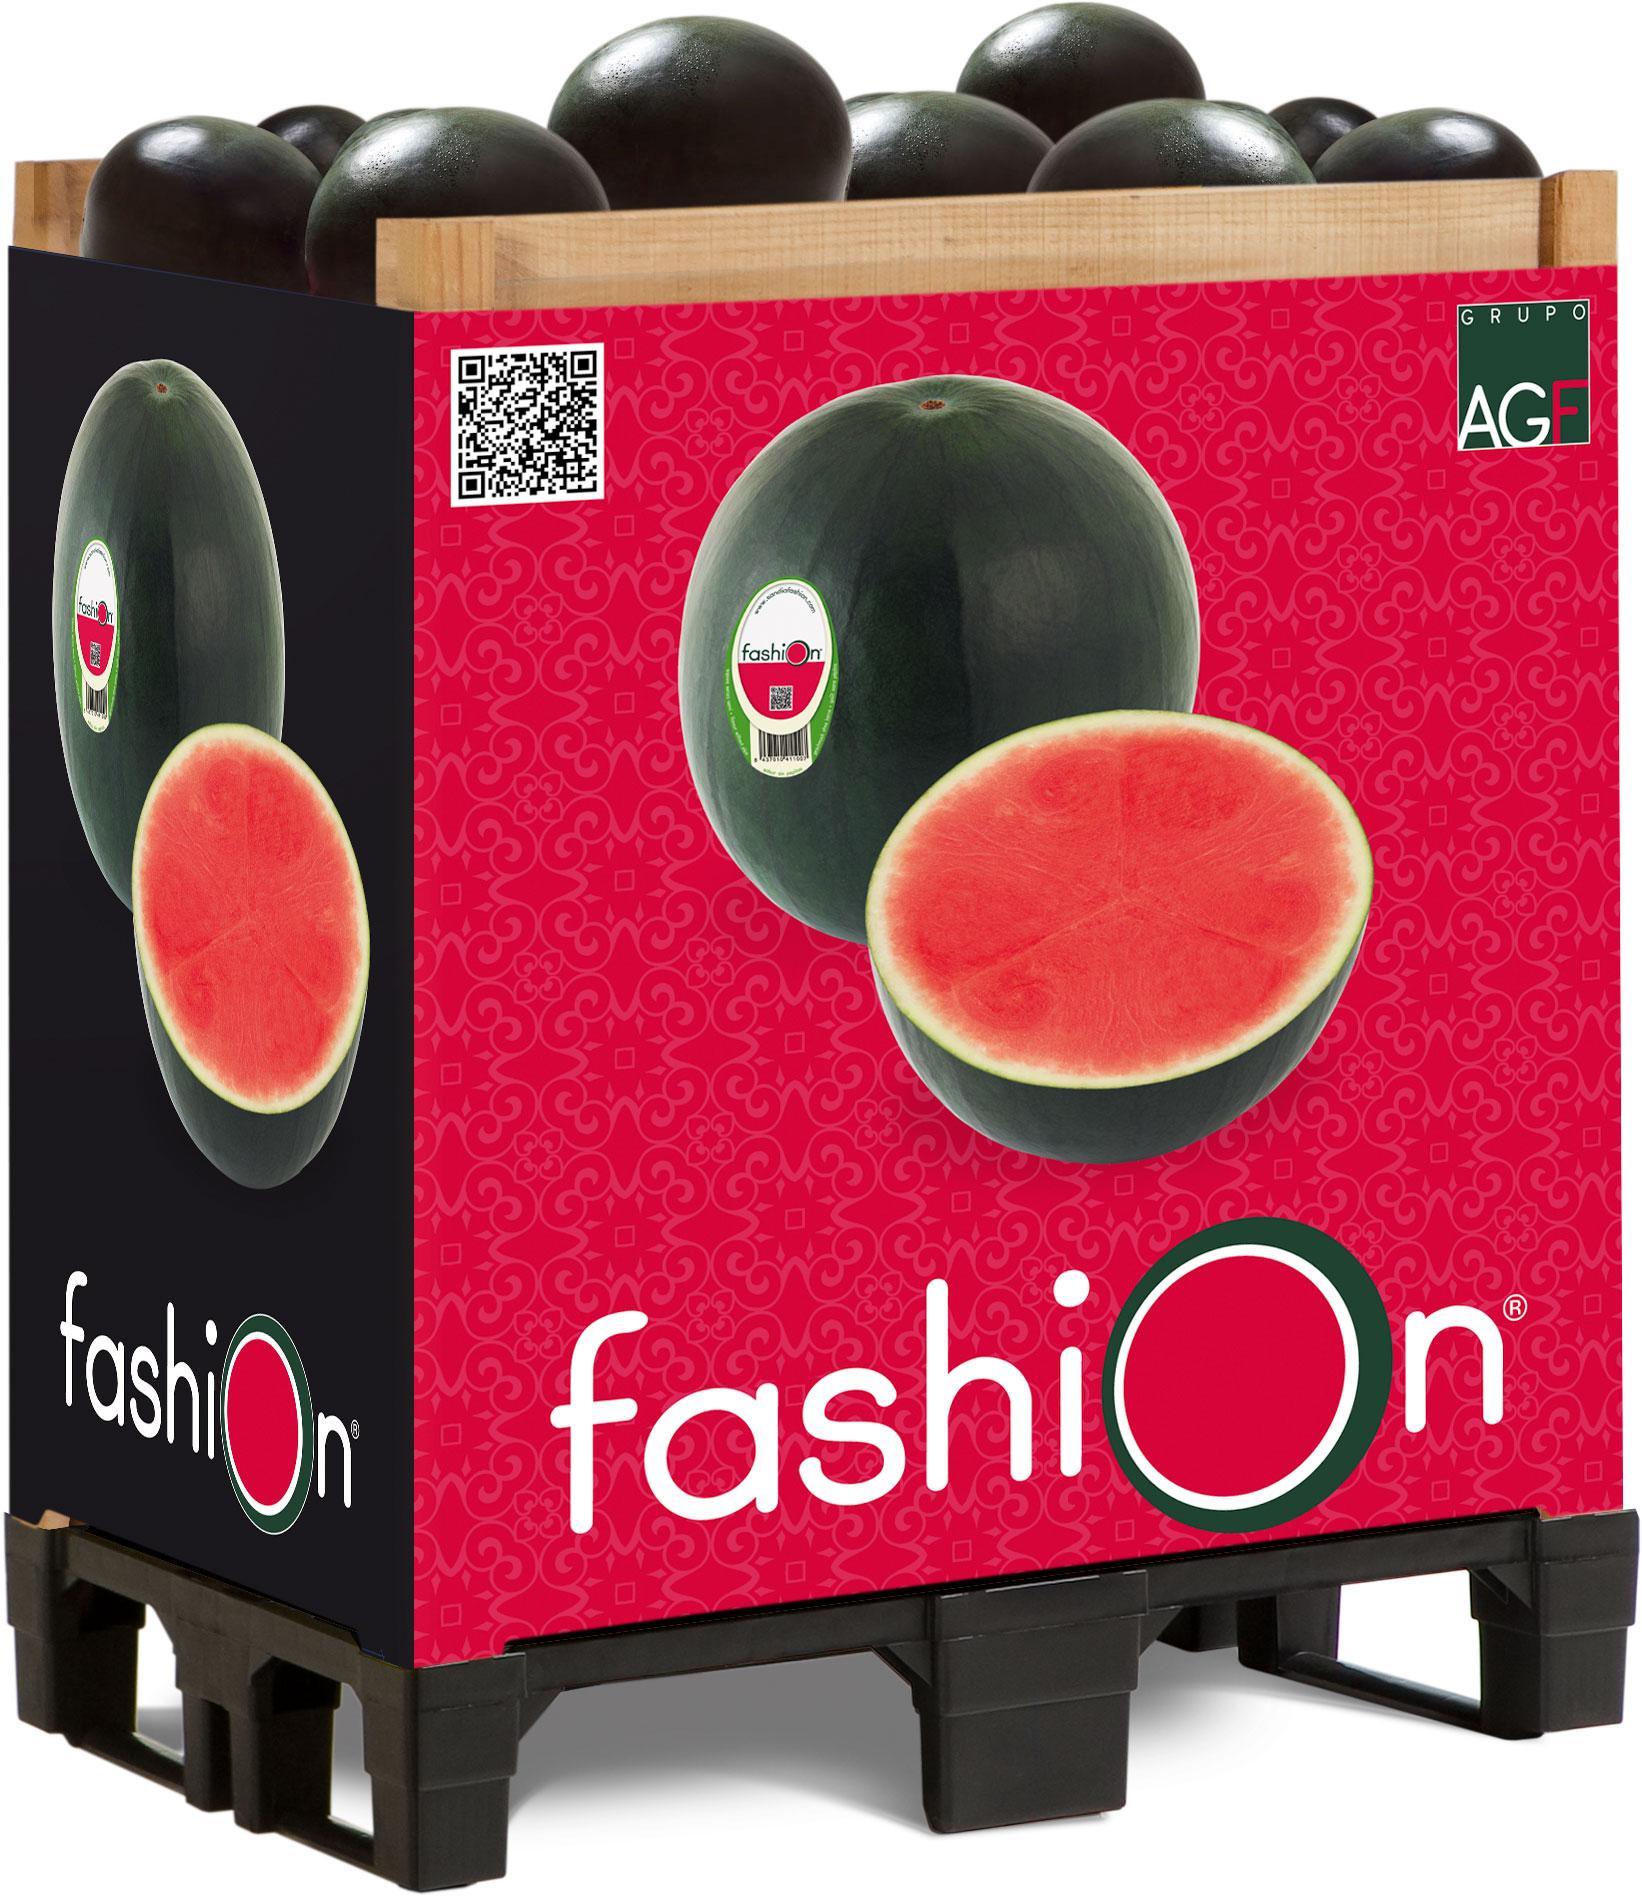 g100 fashion